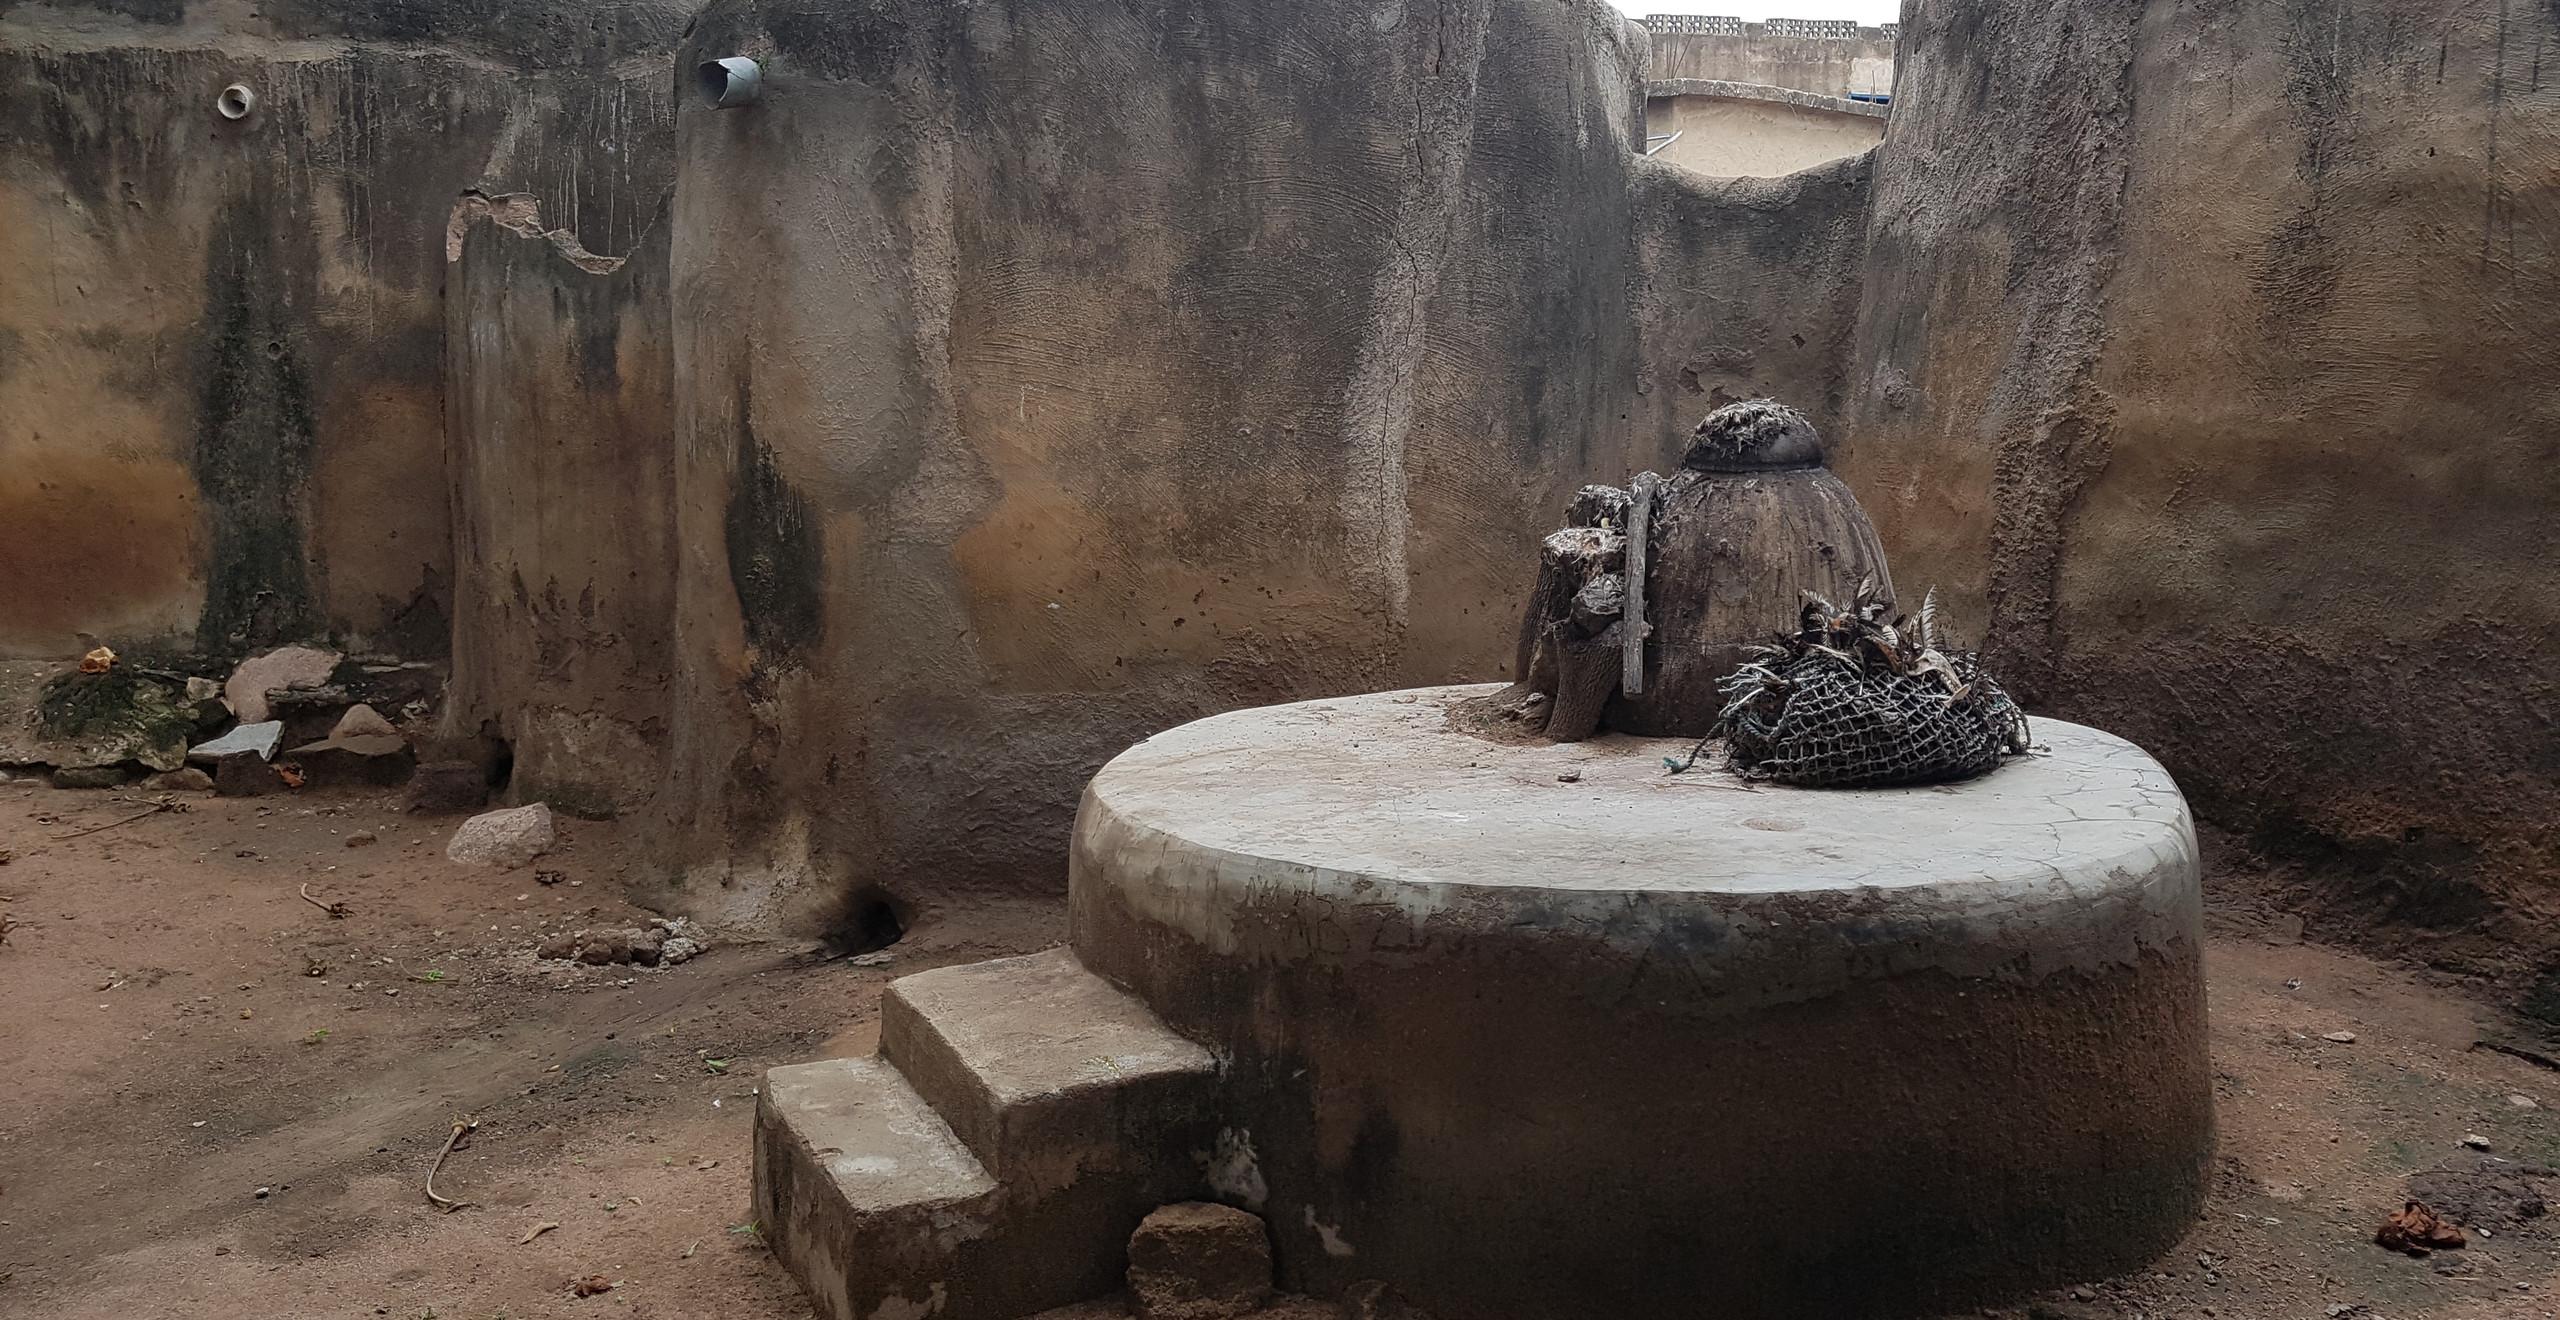 Altar espiritual (Tongo/Gana)